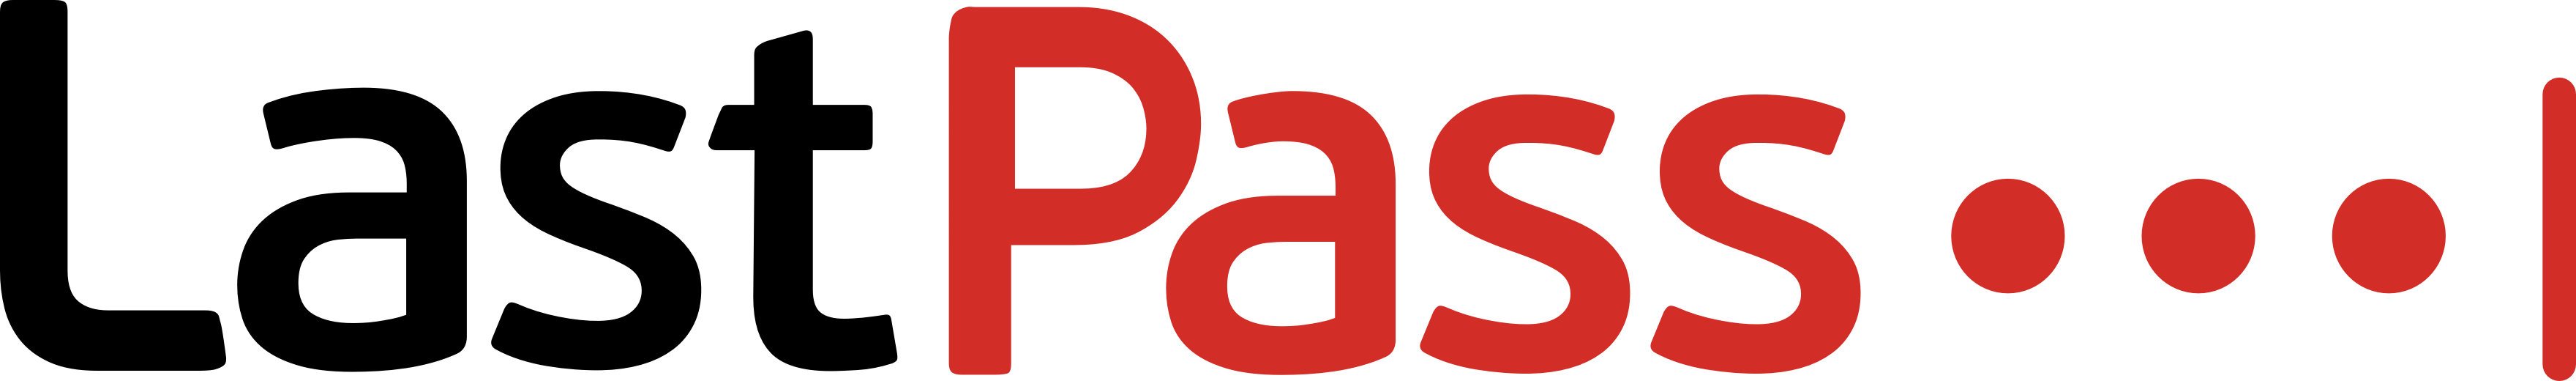 LastPass-logo.png